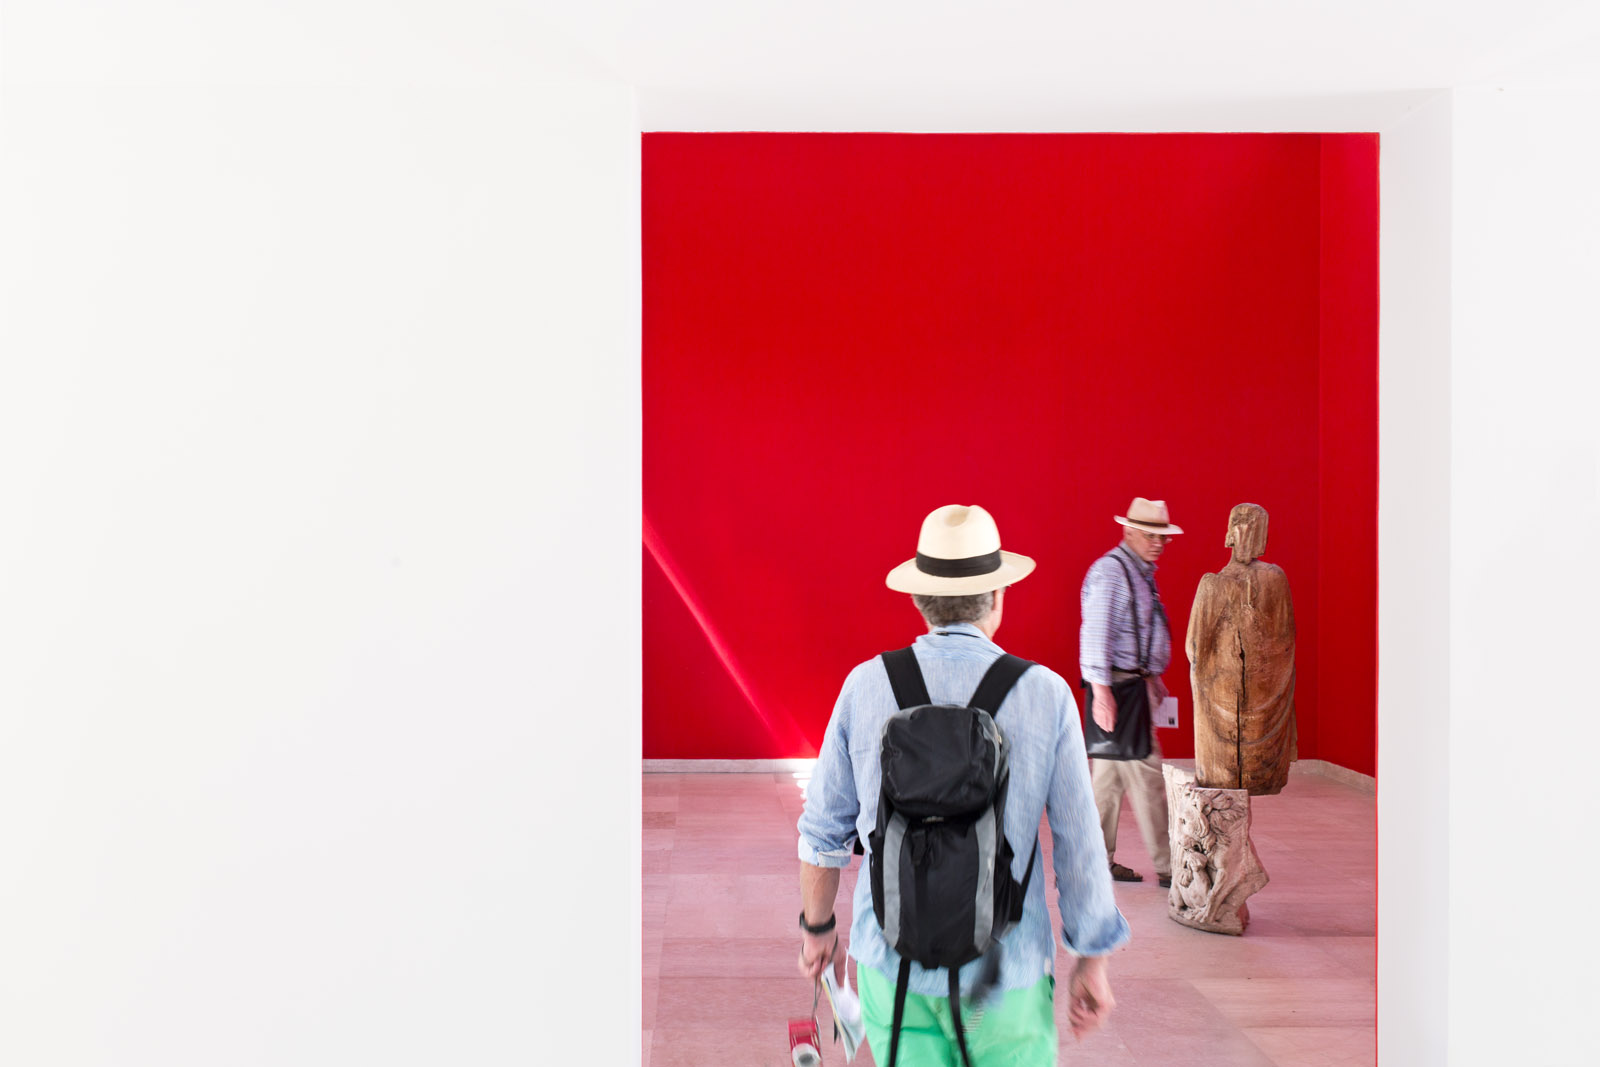 Venice Art Biennale. All rights reserved © Tomas Bertelsen